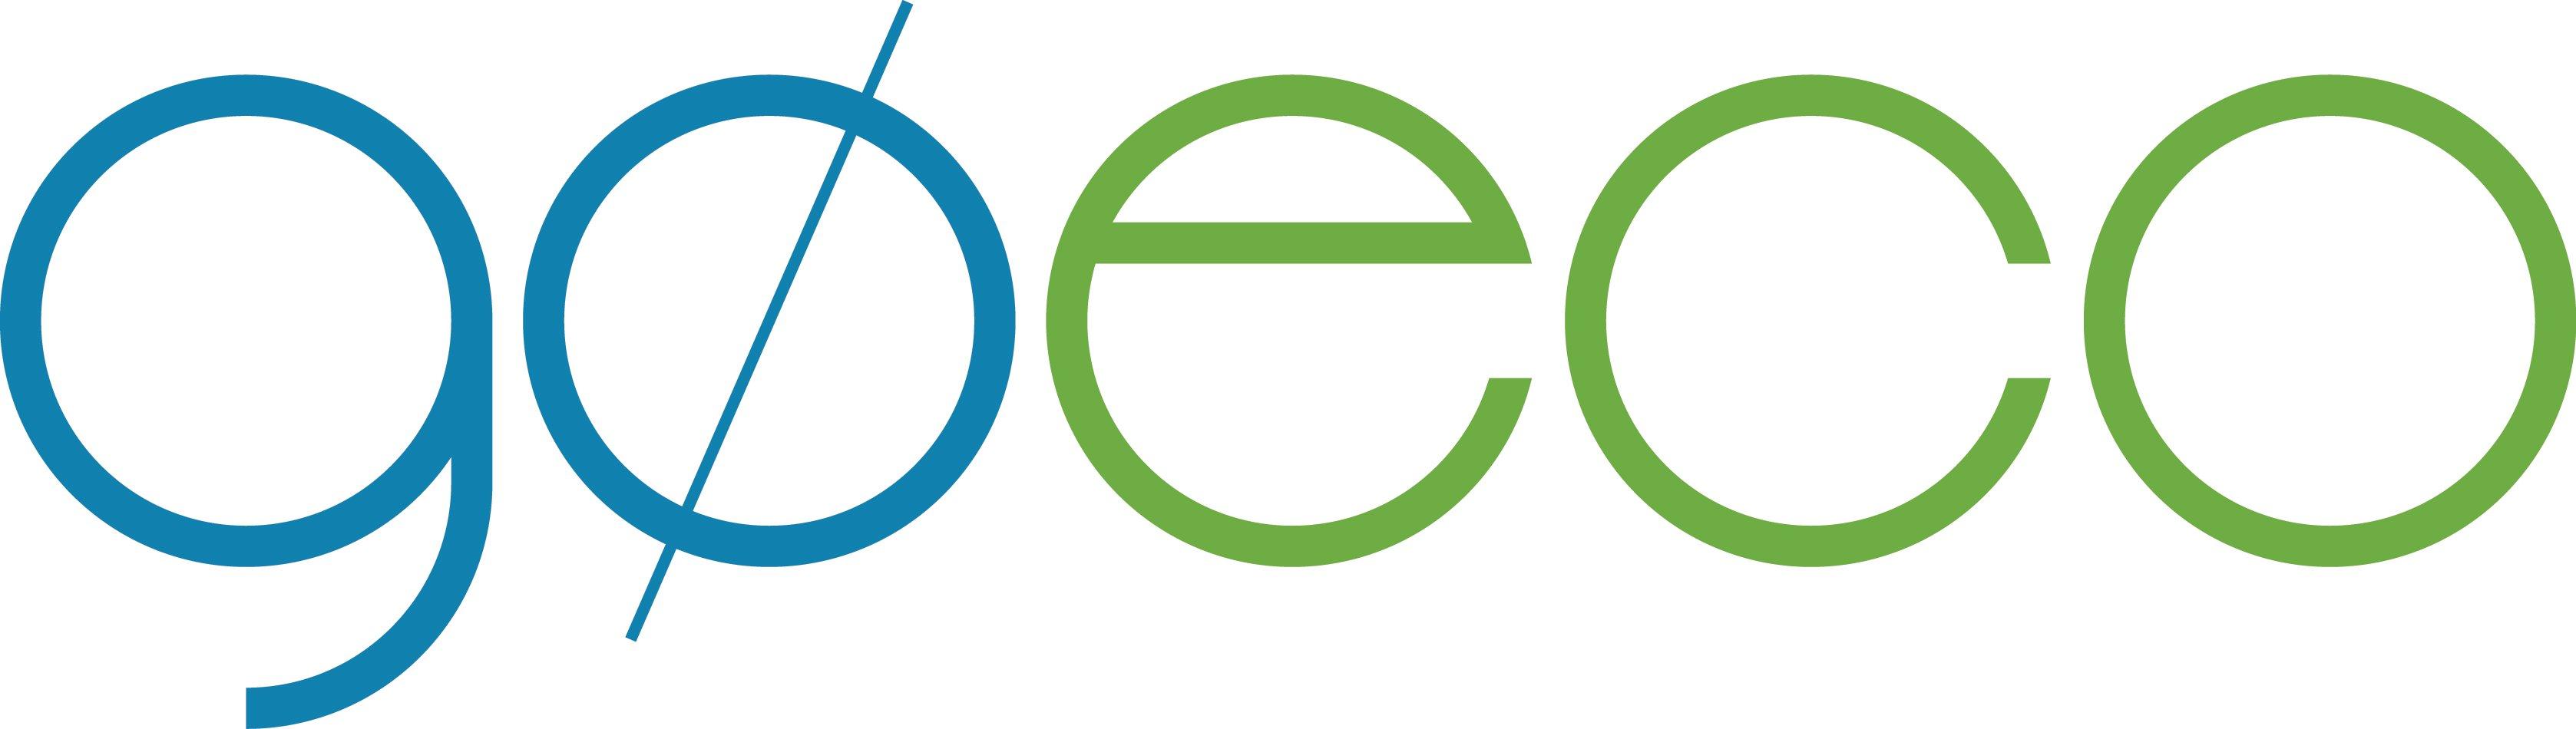 goeco_Logo_final